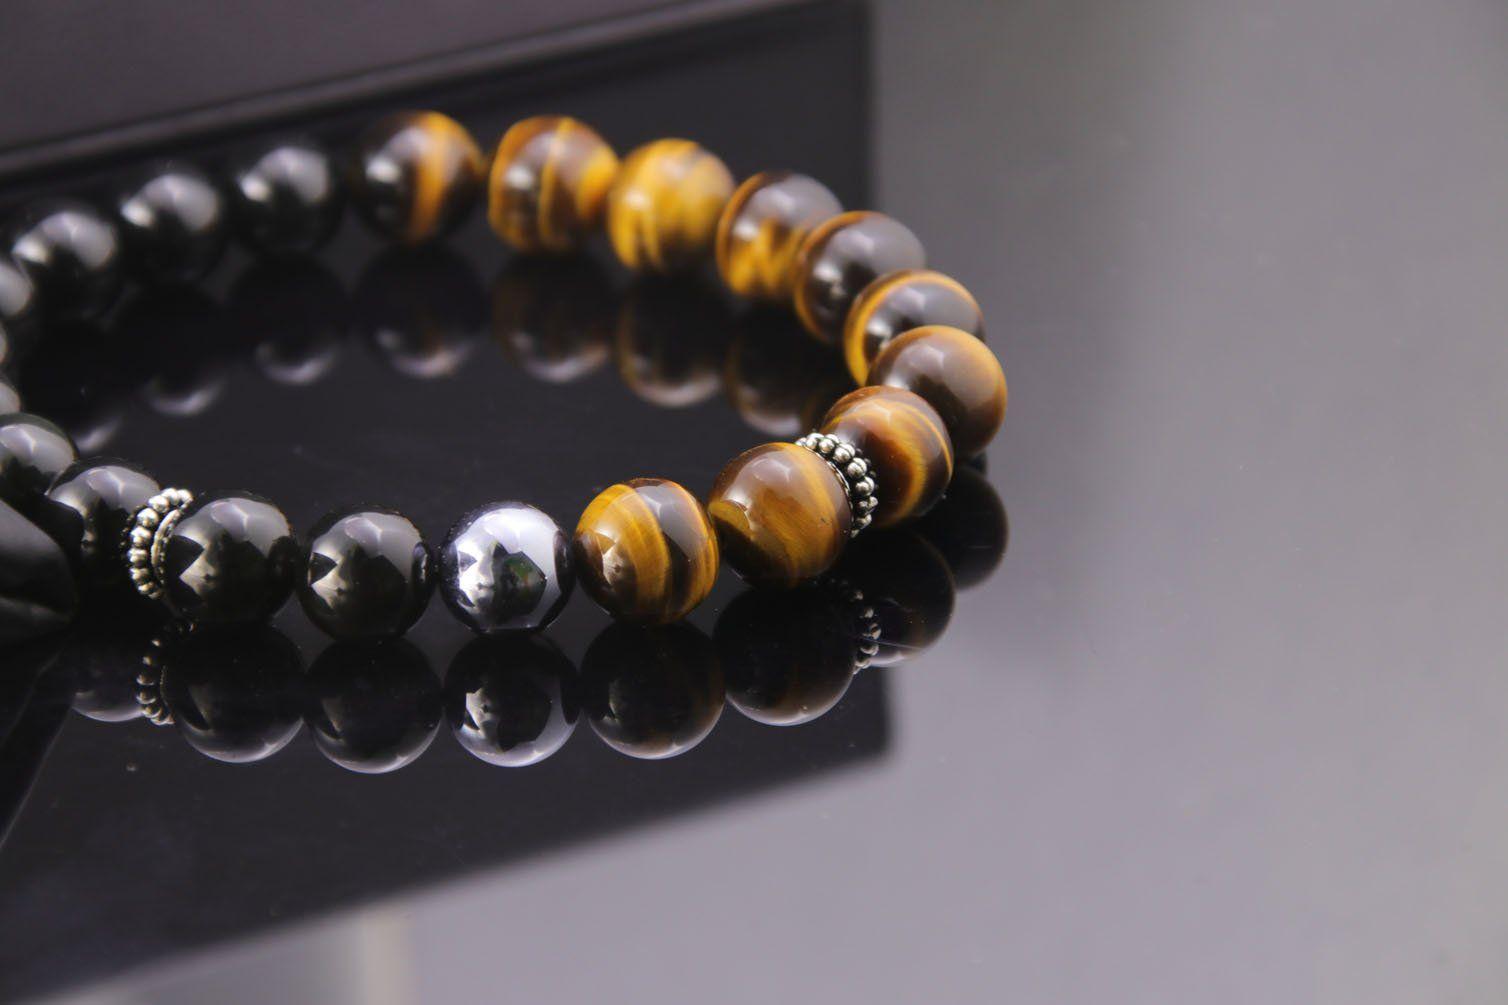 HASKARE Healing Bracelet Mens Chakra Healing Stone Bracelet Tiger Eye Terahertz Obsidian Beads Bracelets